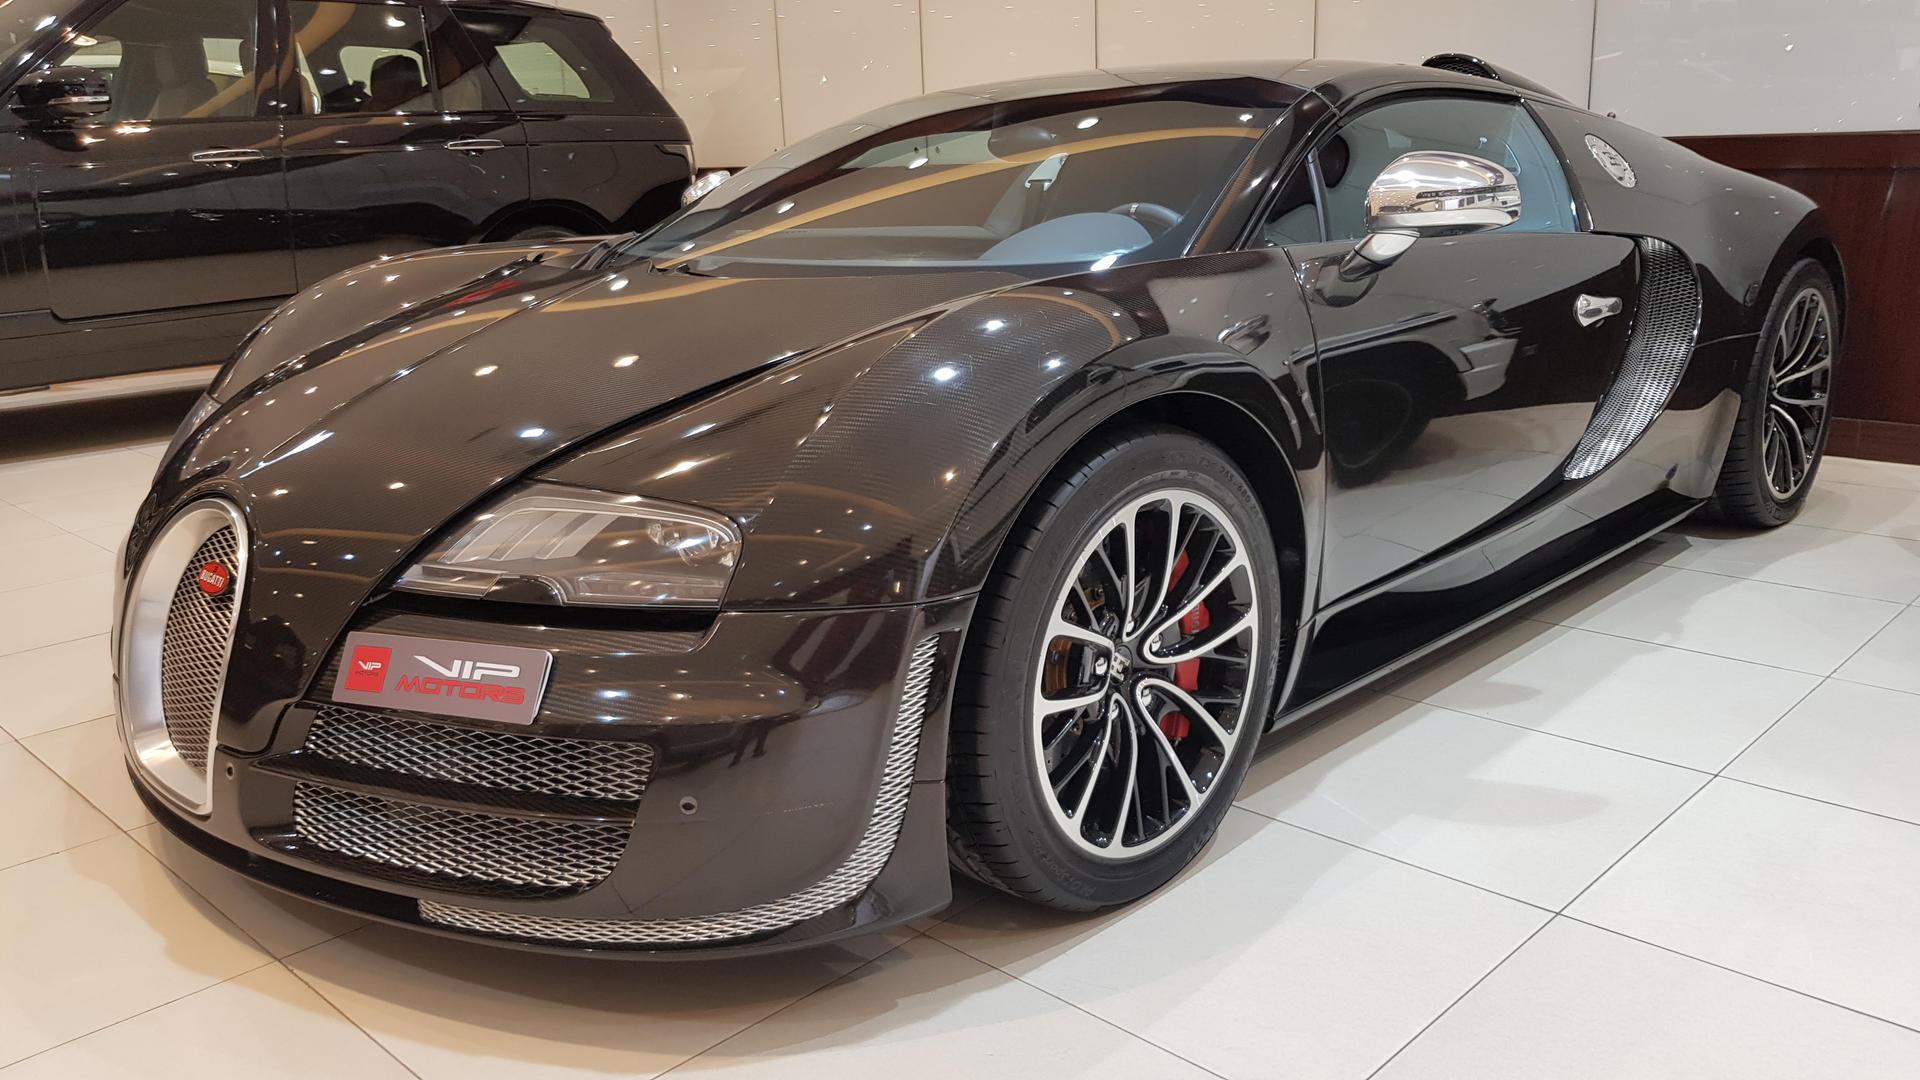 Bugatti Veyron Vitesse Bare Carbon Fiber Body By Haseeb312 On Deviantart